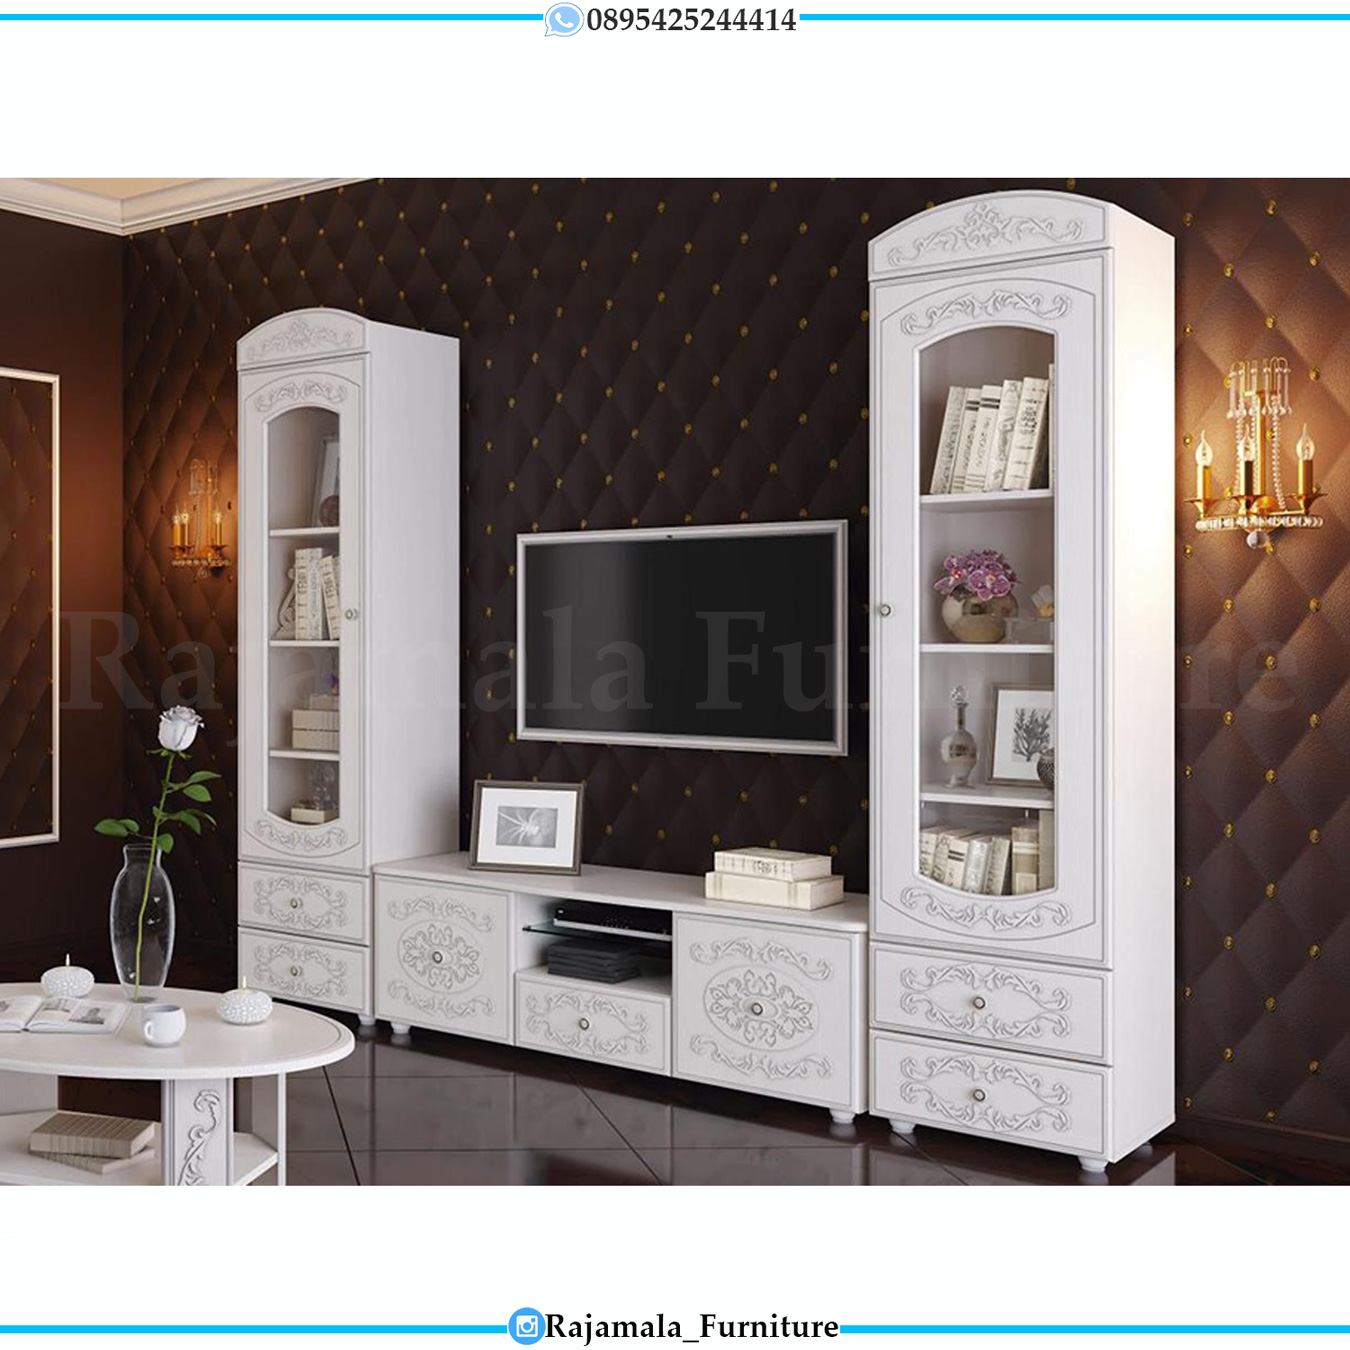 Bufet TV Mewah Luxury Classic White Duco Furniture Jepara Terbaru RM-0509